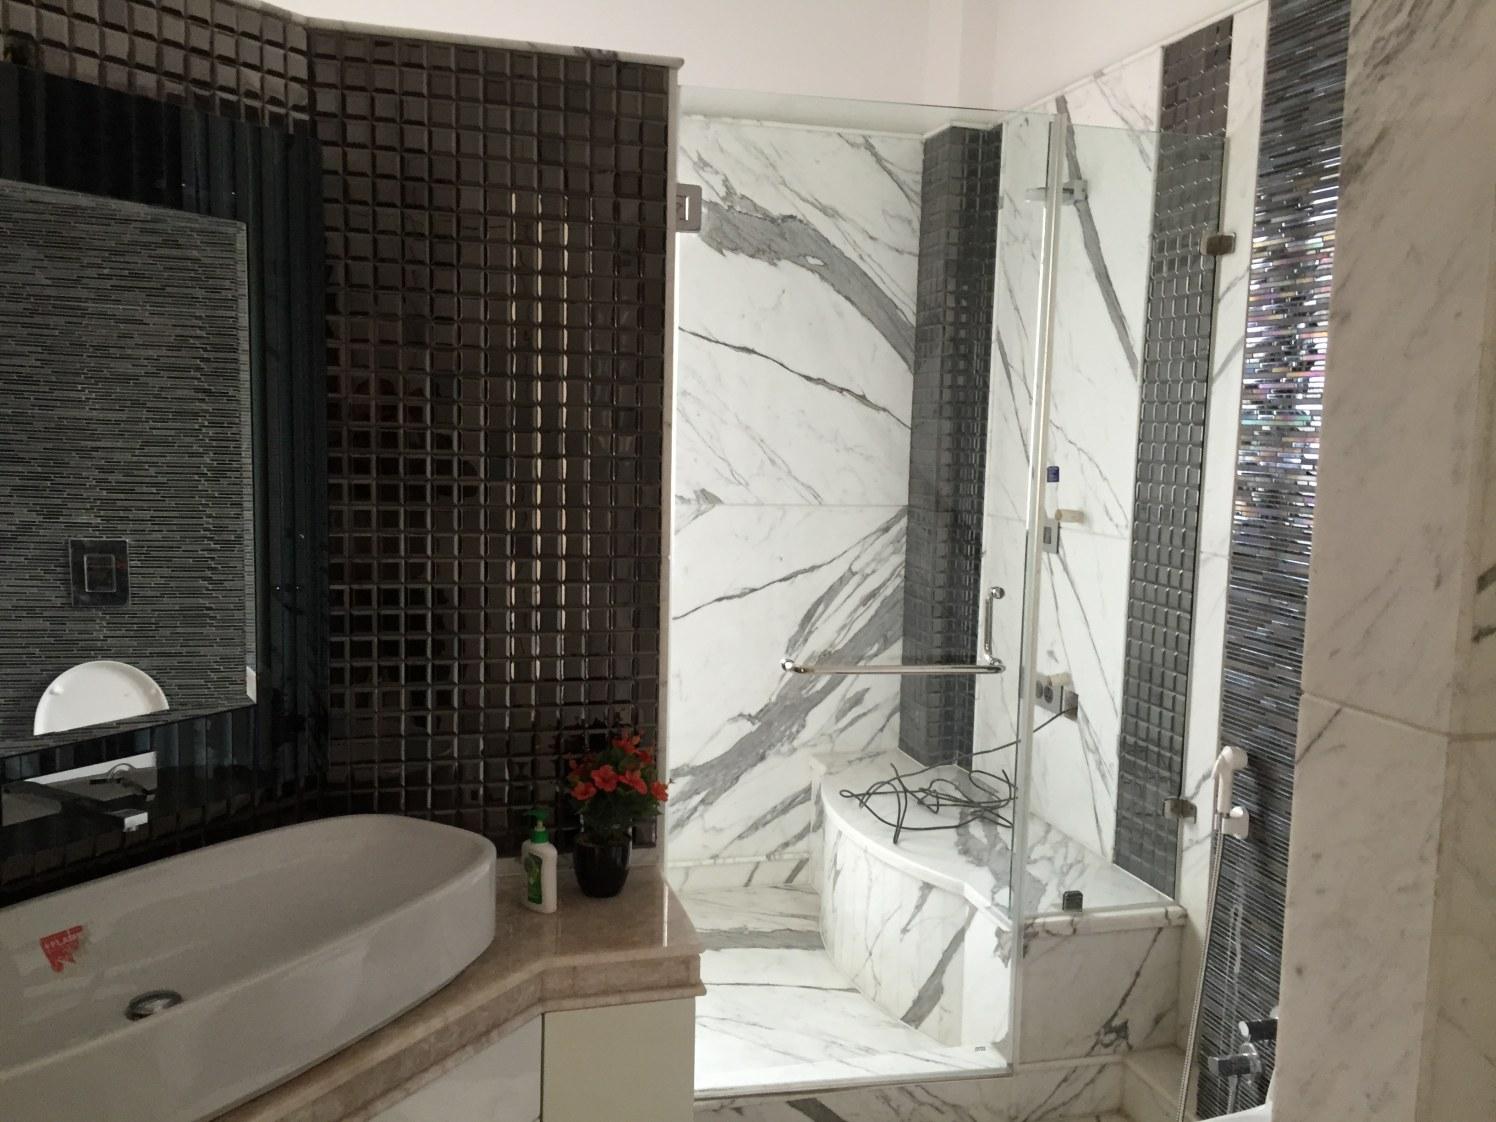 Bathroom With Glass Partition by Tarique Anwar Bathroom Contemporary | Interior Design Photos & Ideas